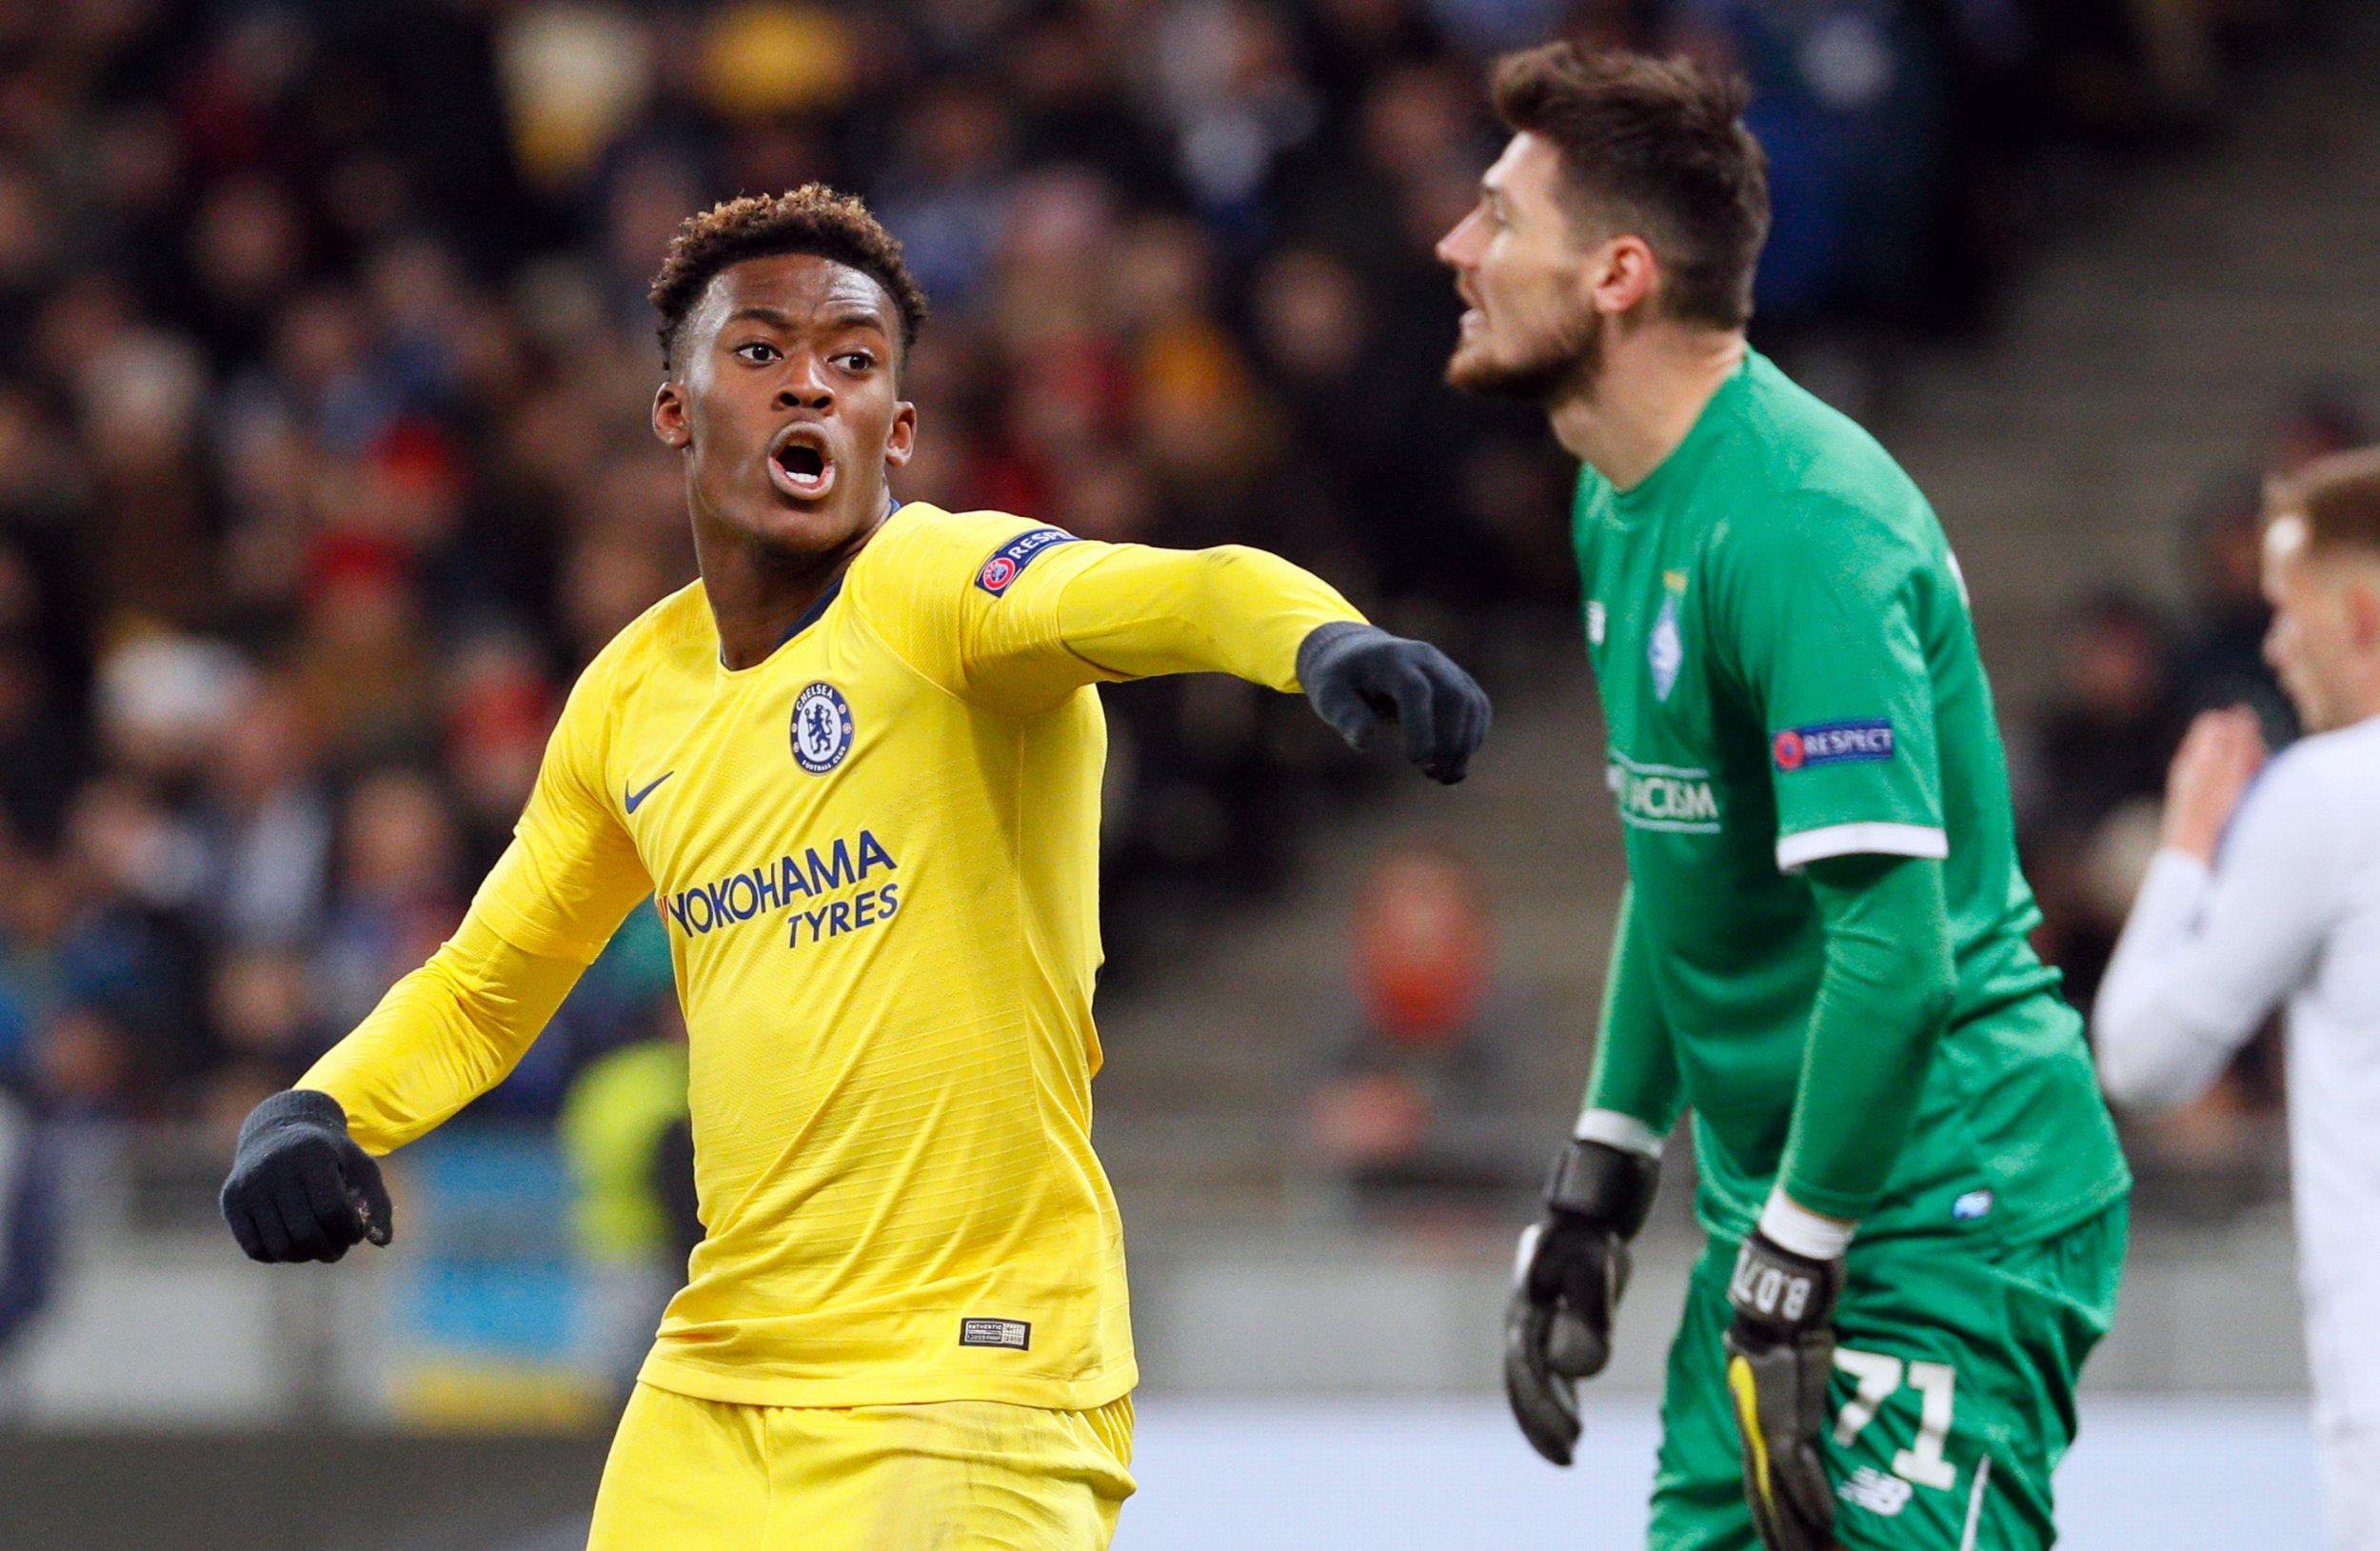 Callum Hudson-Odoi might have to leave Chelsea, says Glenn Hoddle